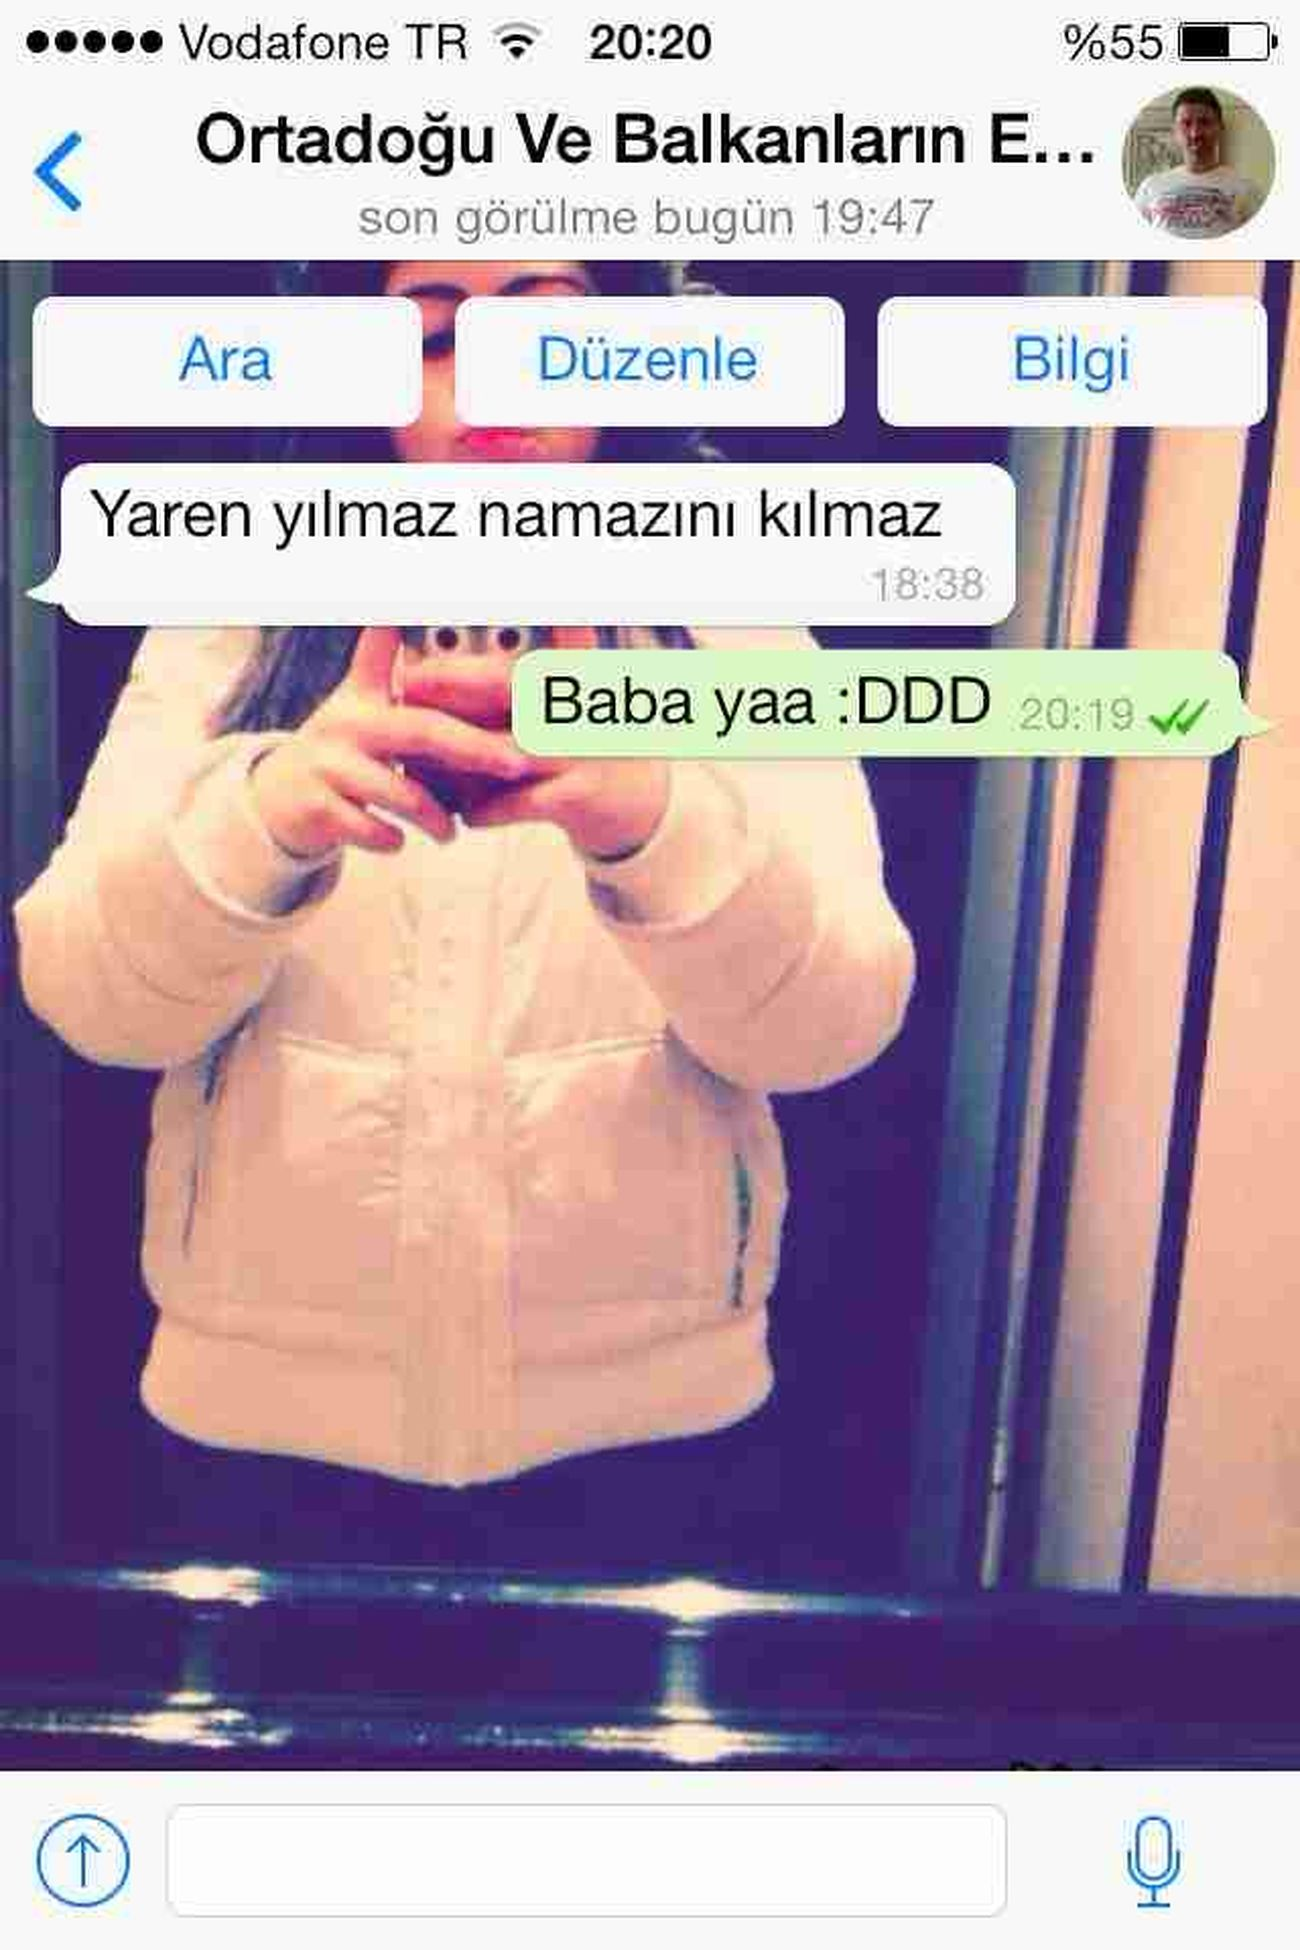 whatsapp :D Hi!